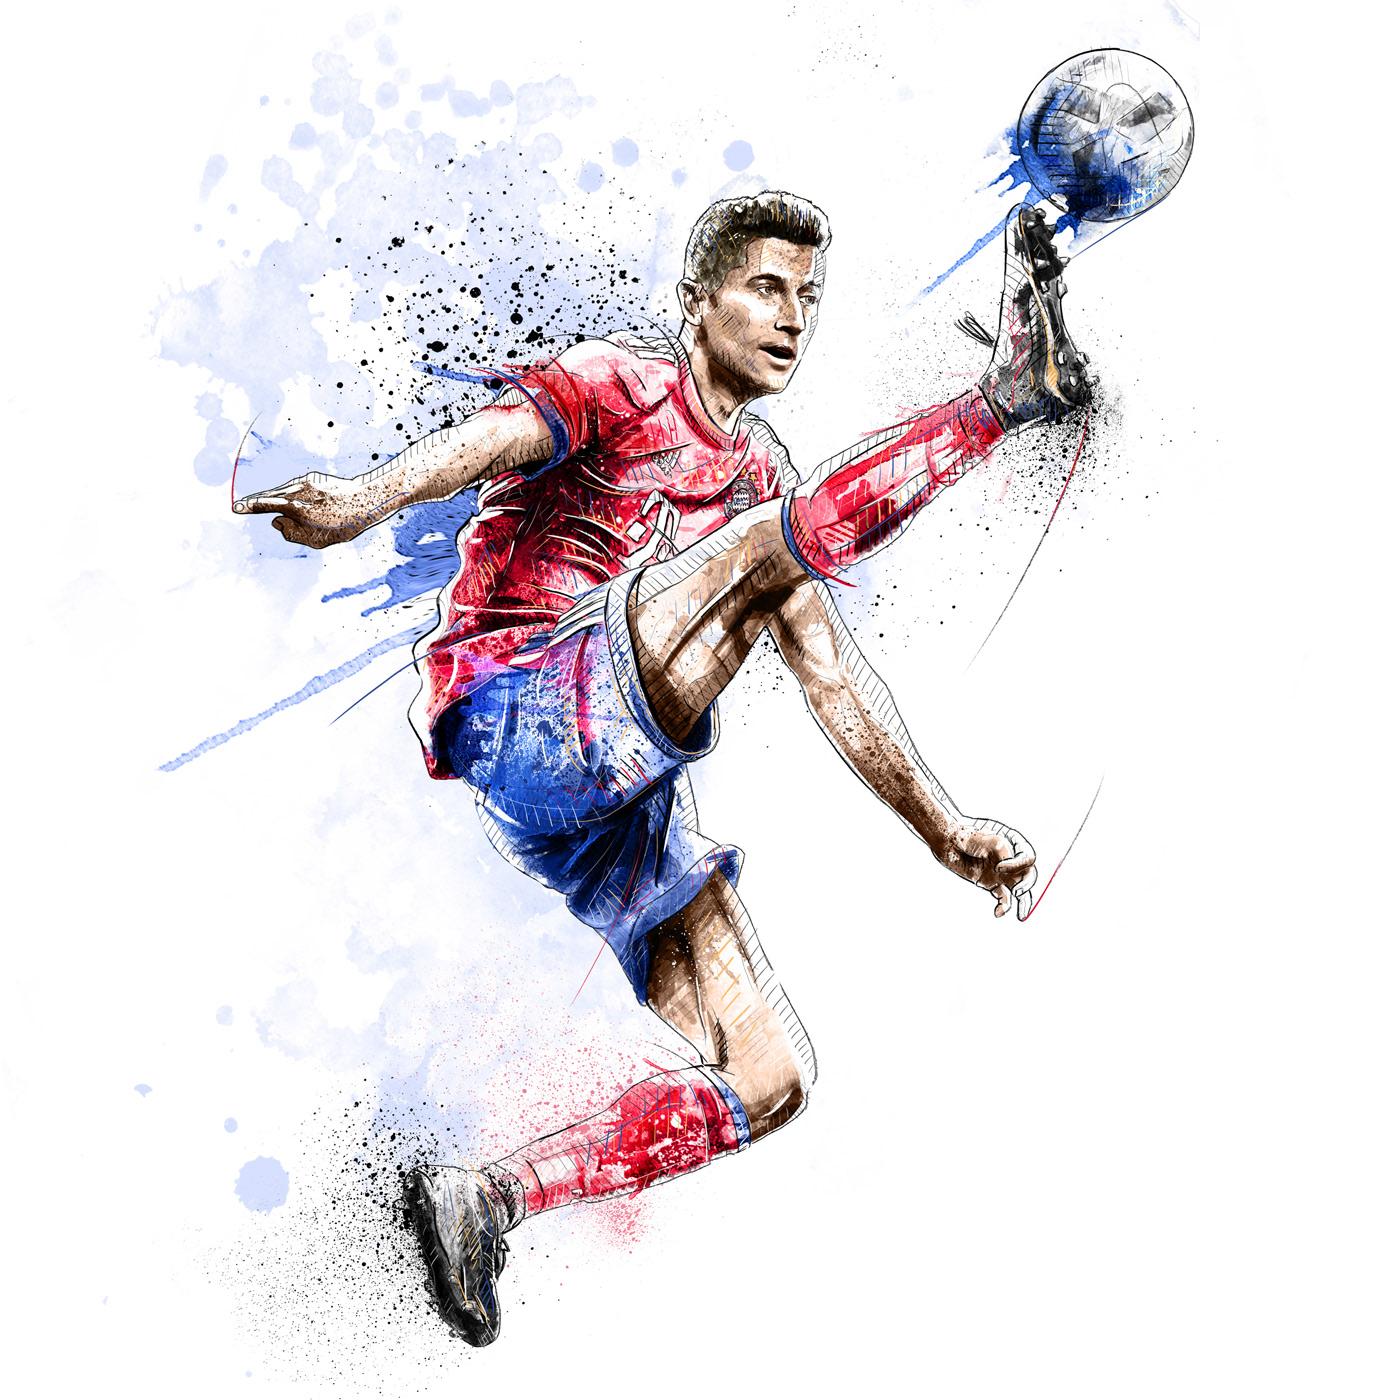 watercolor sport FC Bayern football soccer champions league sportive atheletes Dynamic portrait